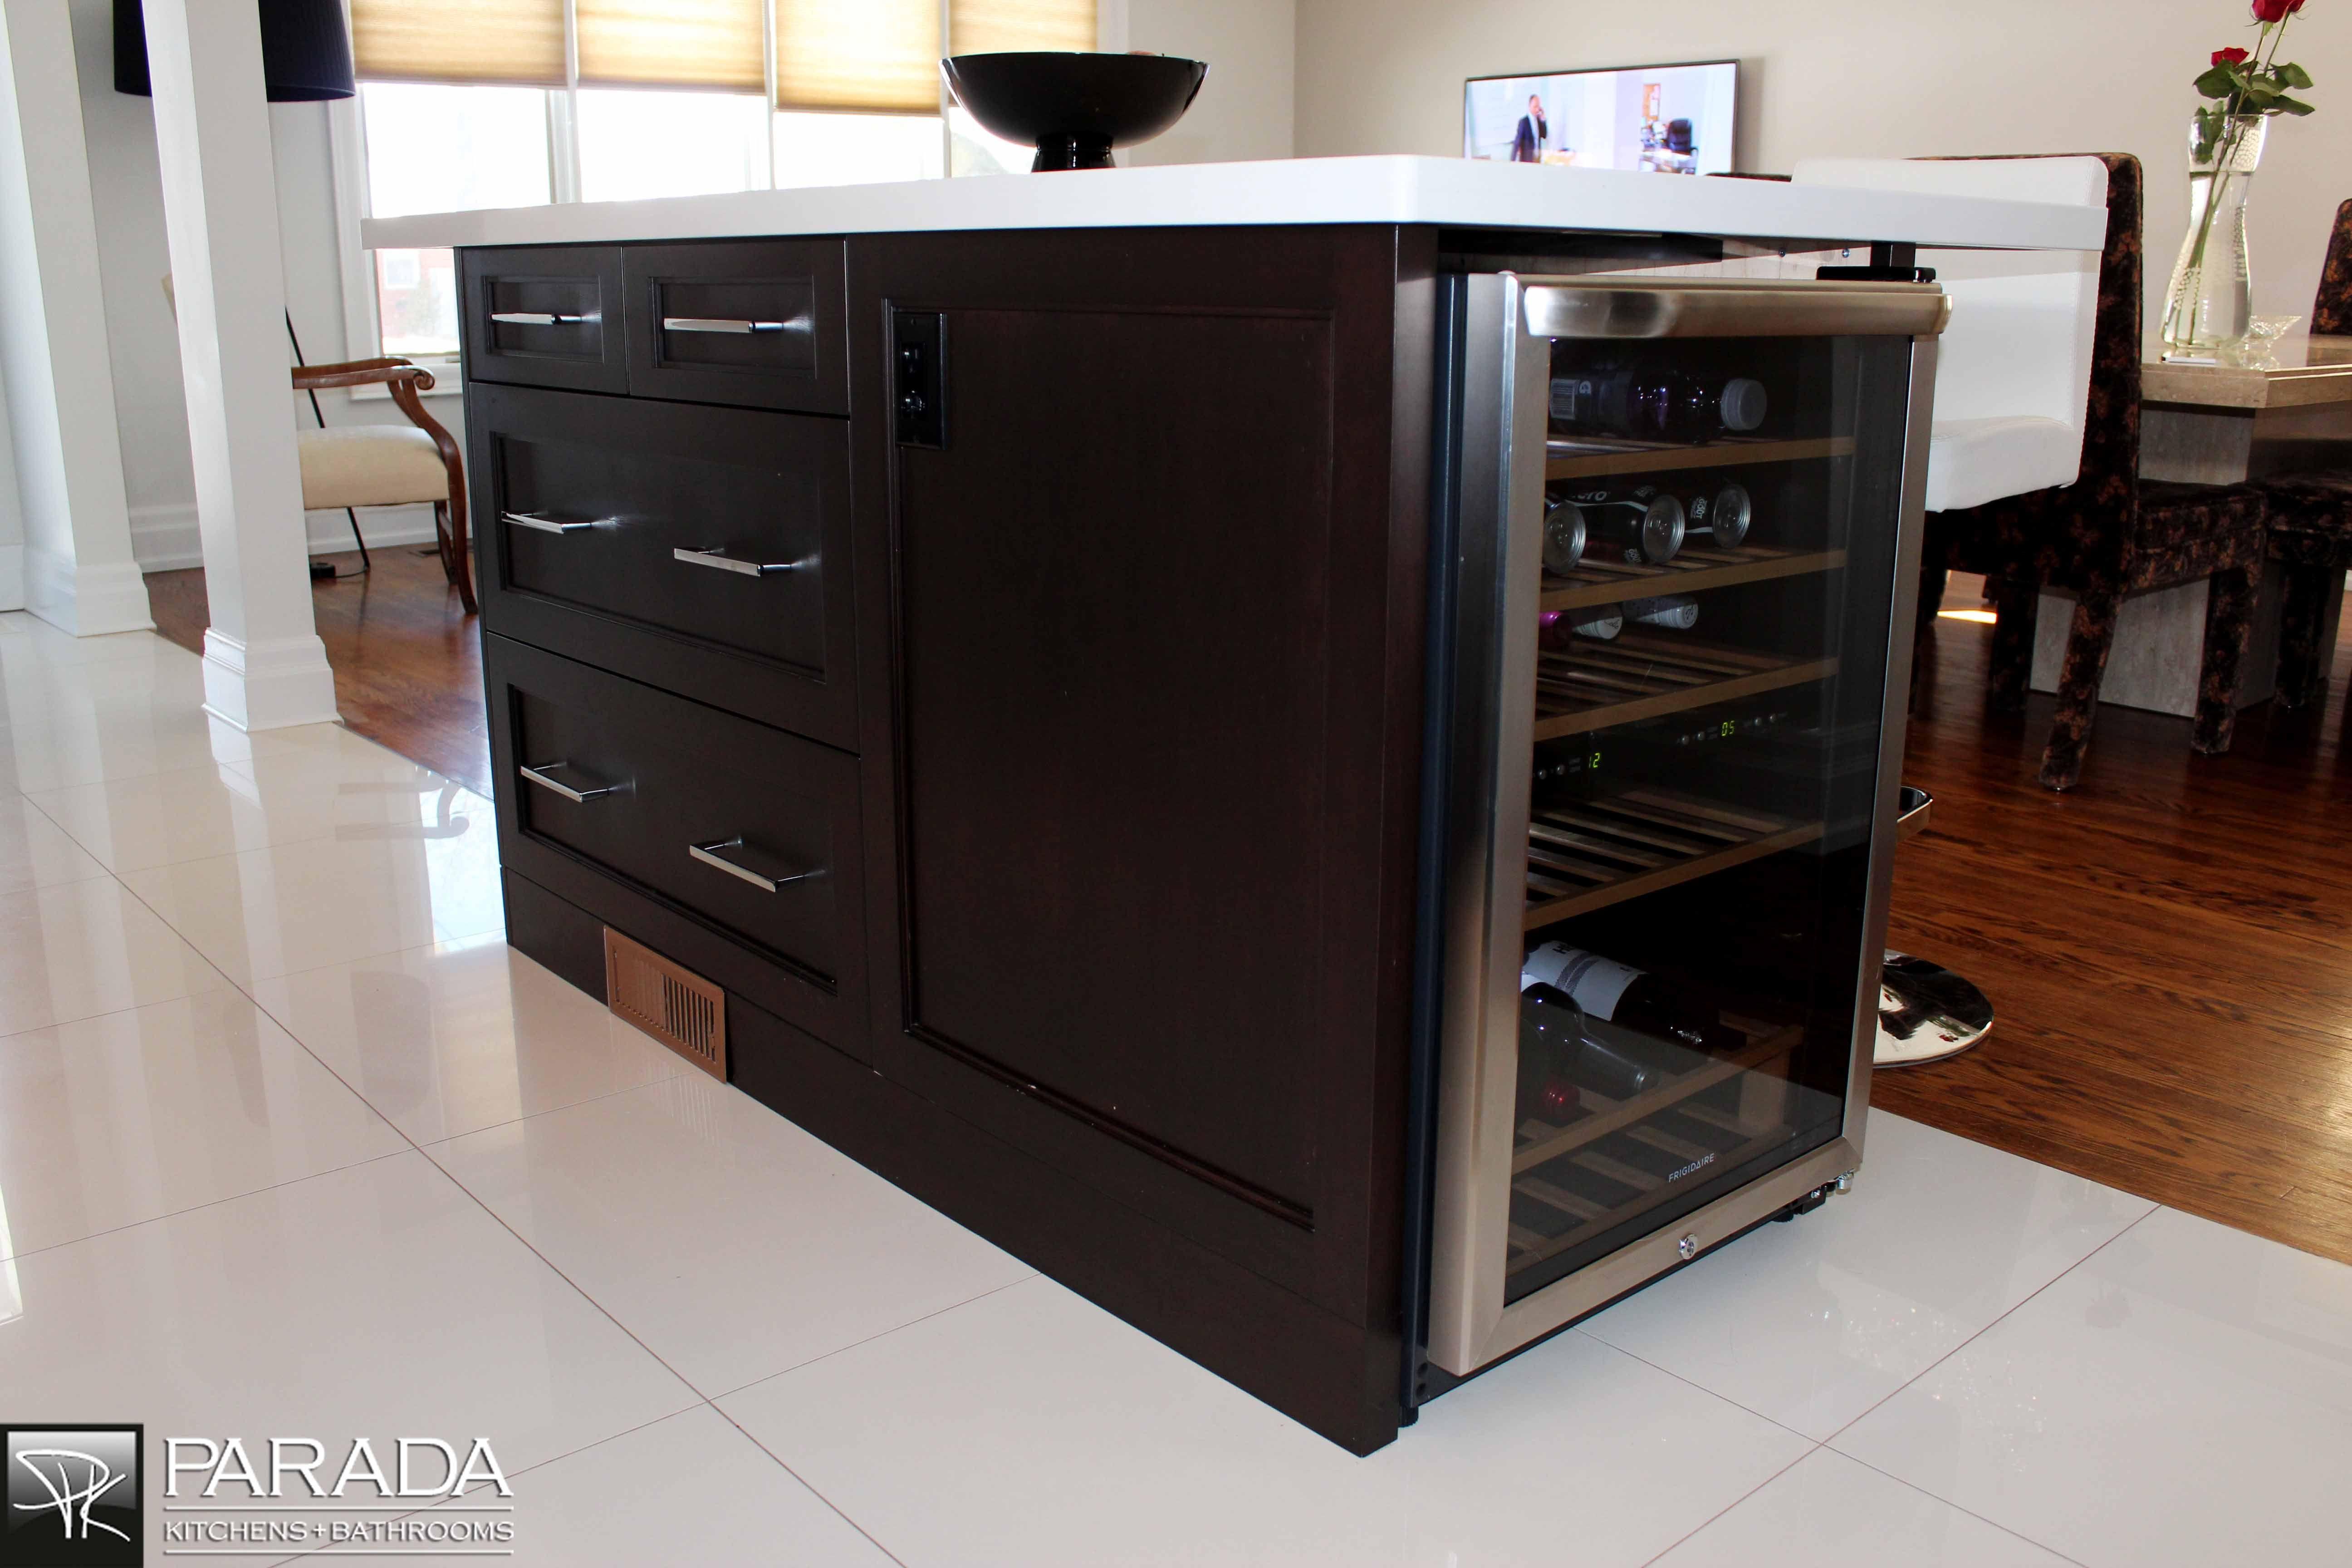 built-in wine cooler.   KITCHEN CABINET DESIGNS   Pinterest